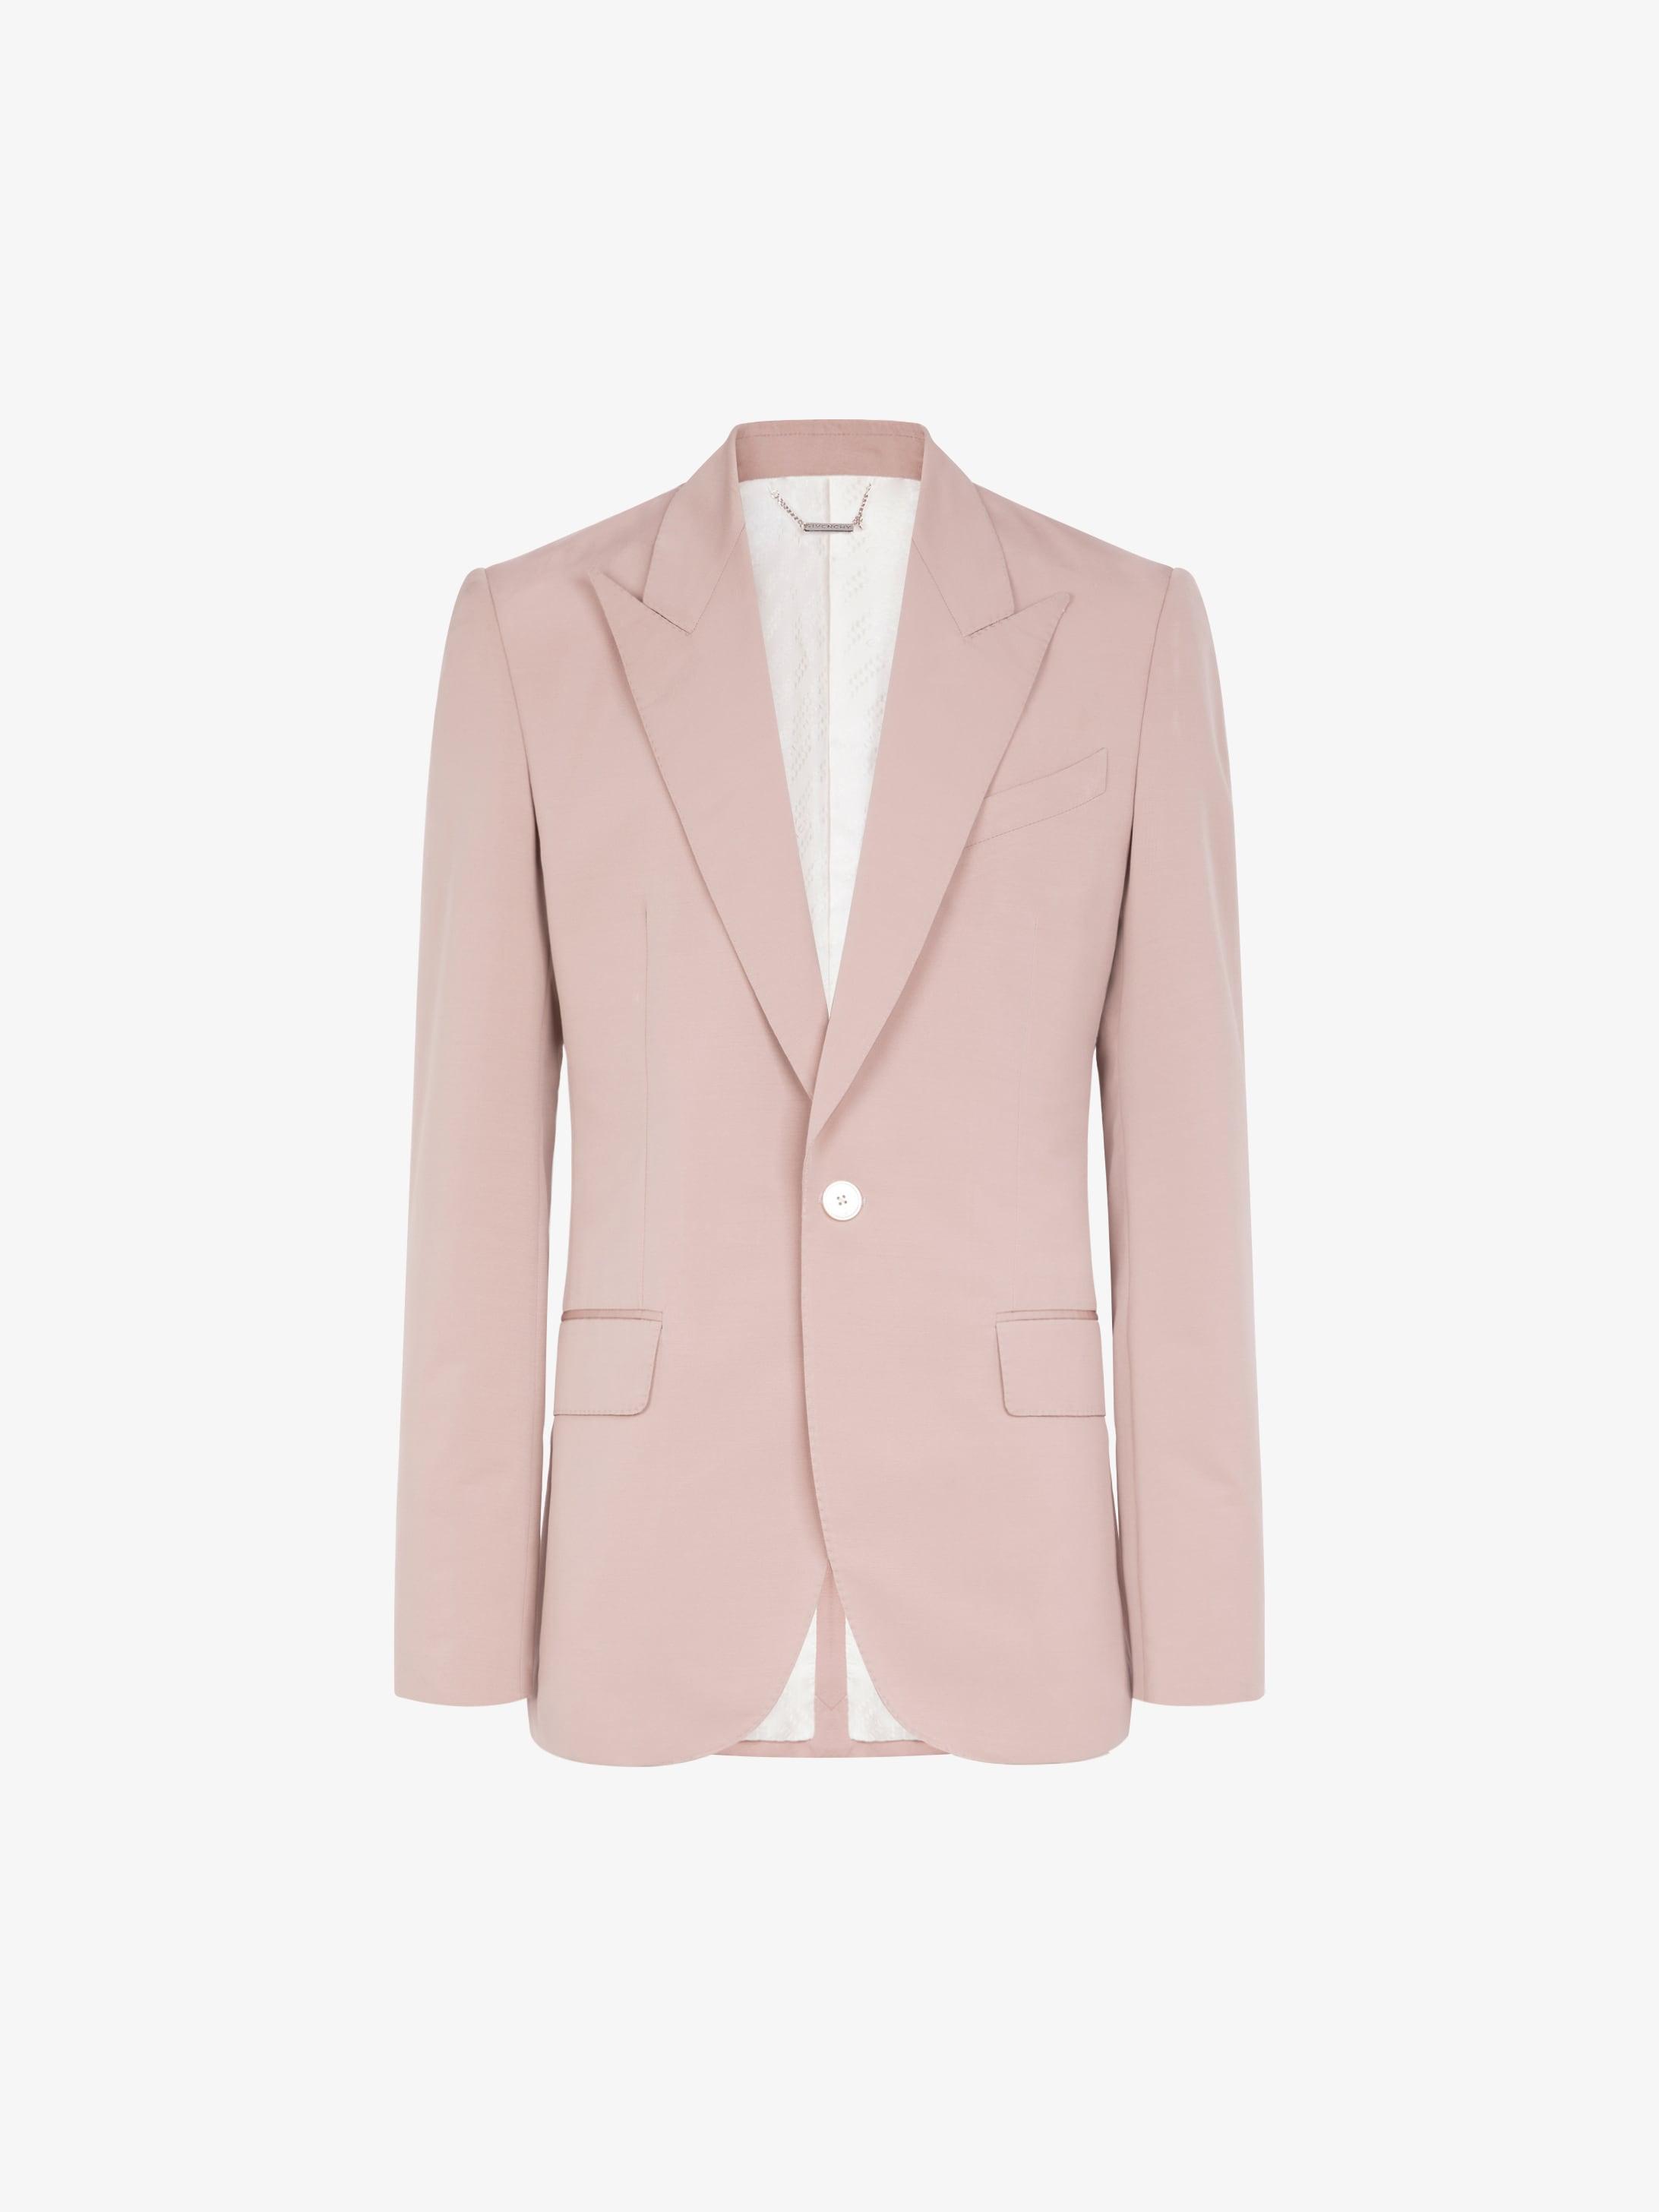 Jacket in textured wool